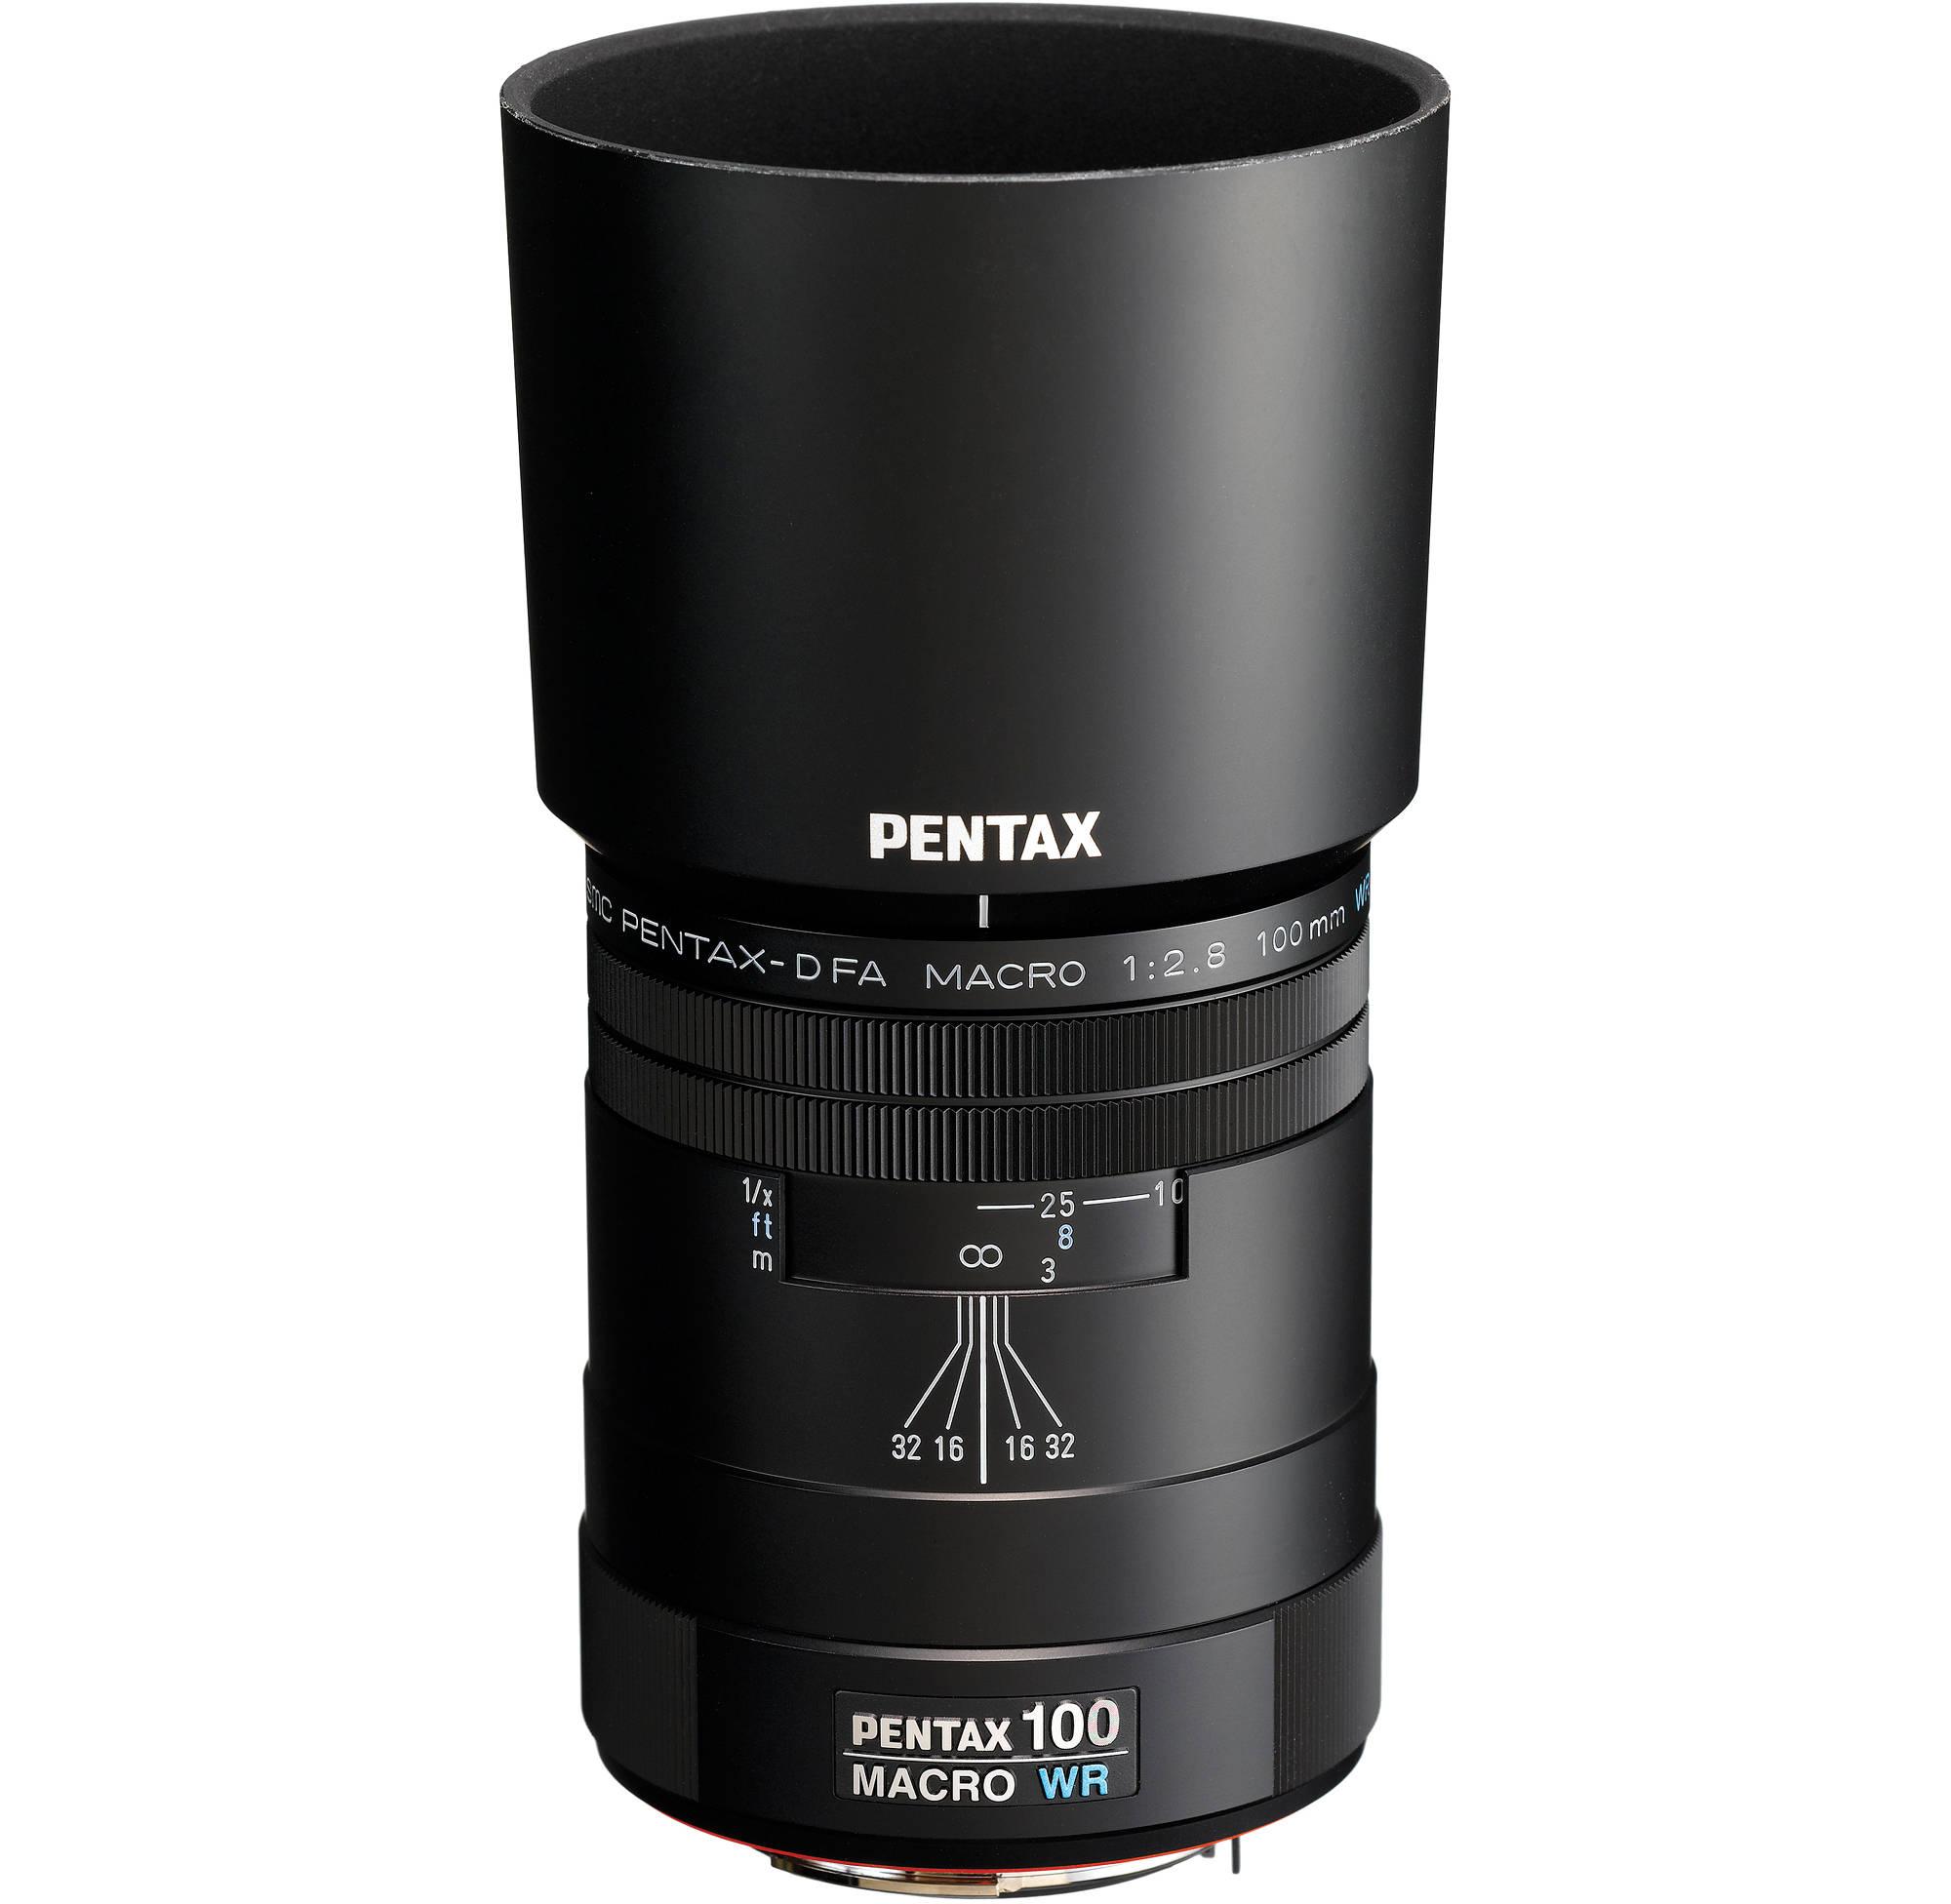 Pentax smc Pentax-D FA 100mm f/2.8 WR Macro Lens